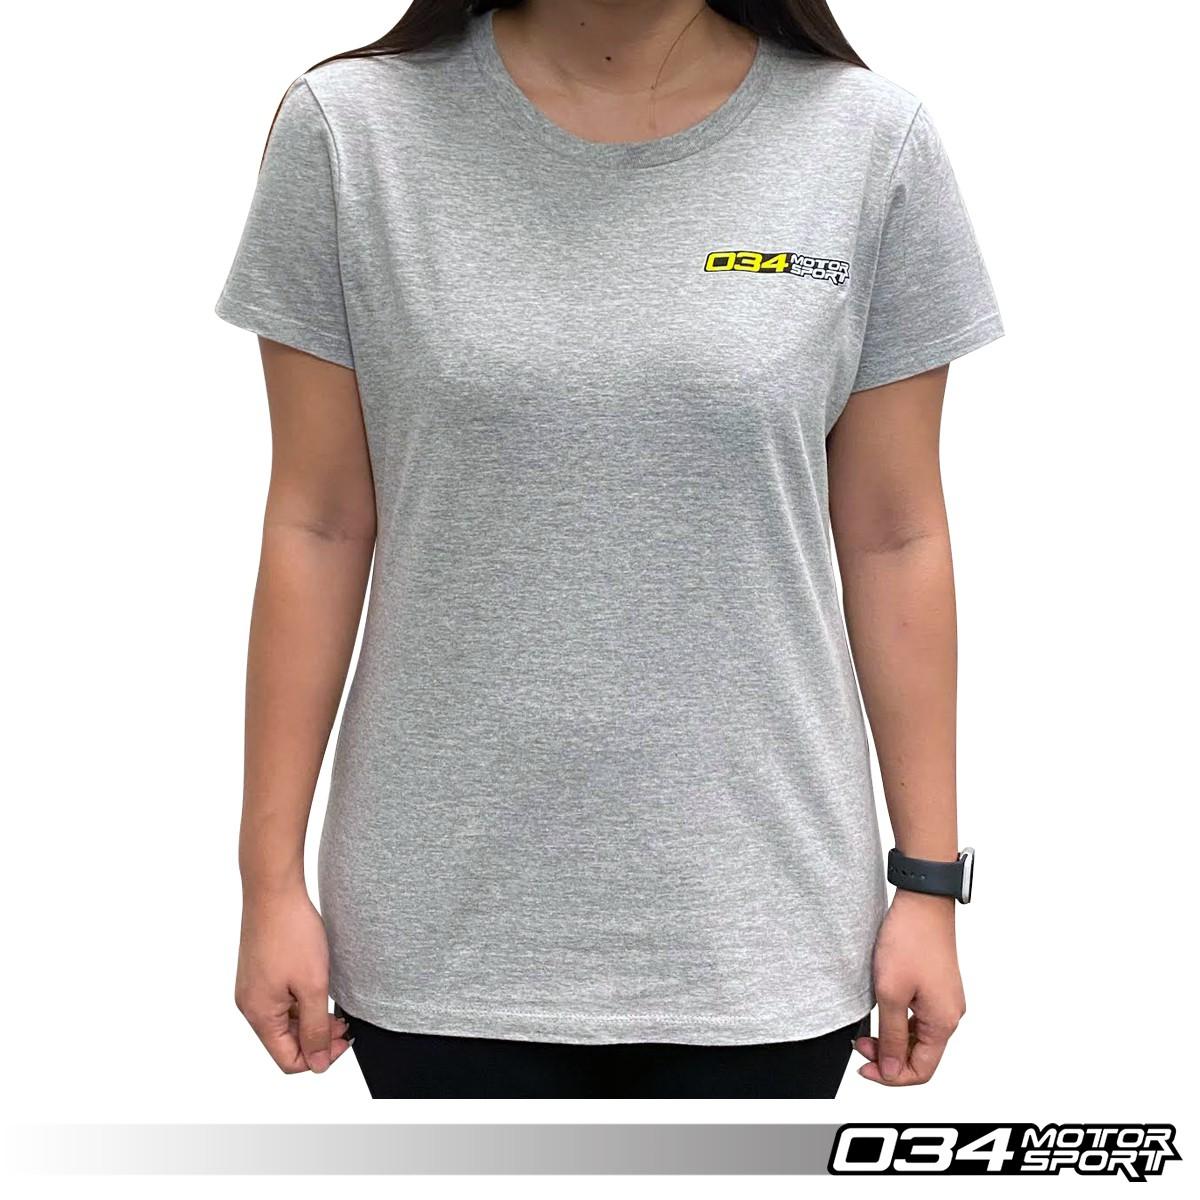 "T-Shirt, ""034Motorsport"", Gray, Women's 034-A01-1020-W"